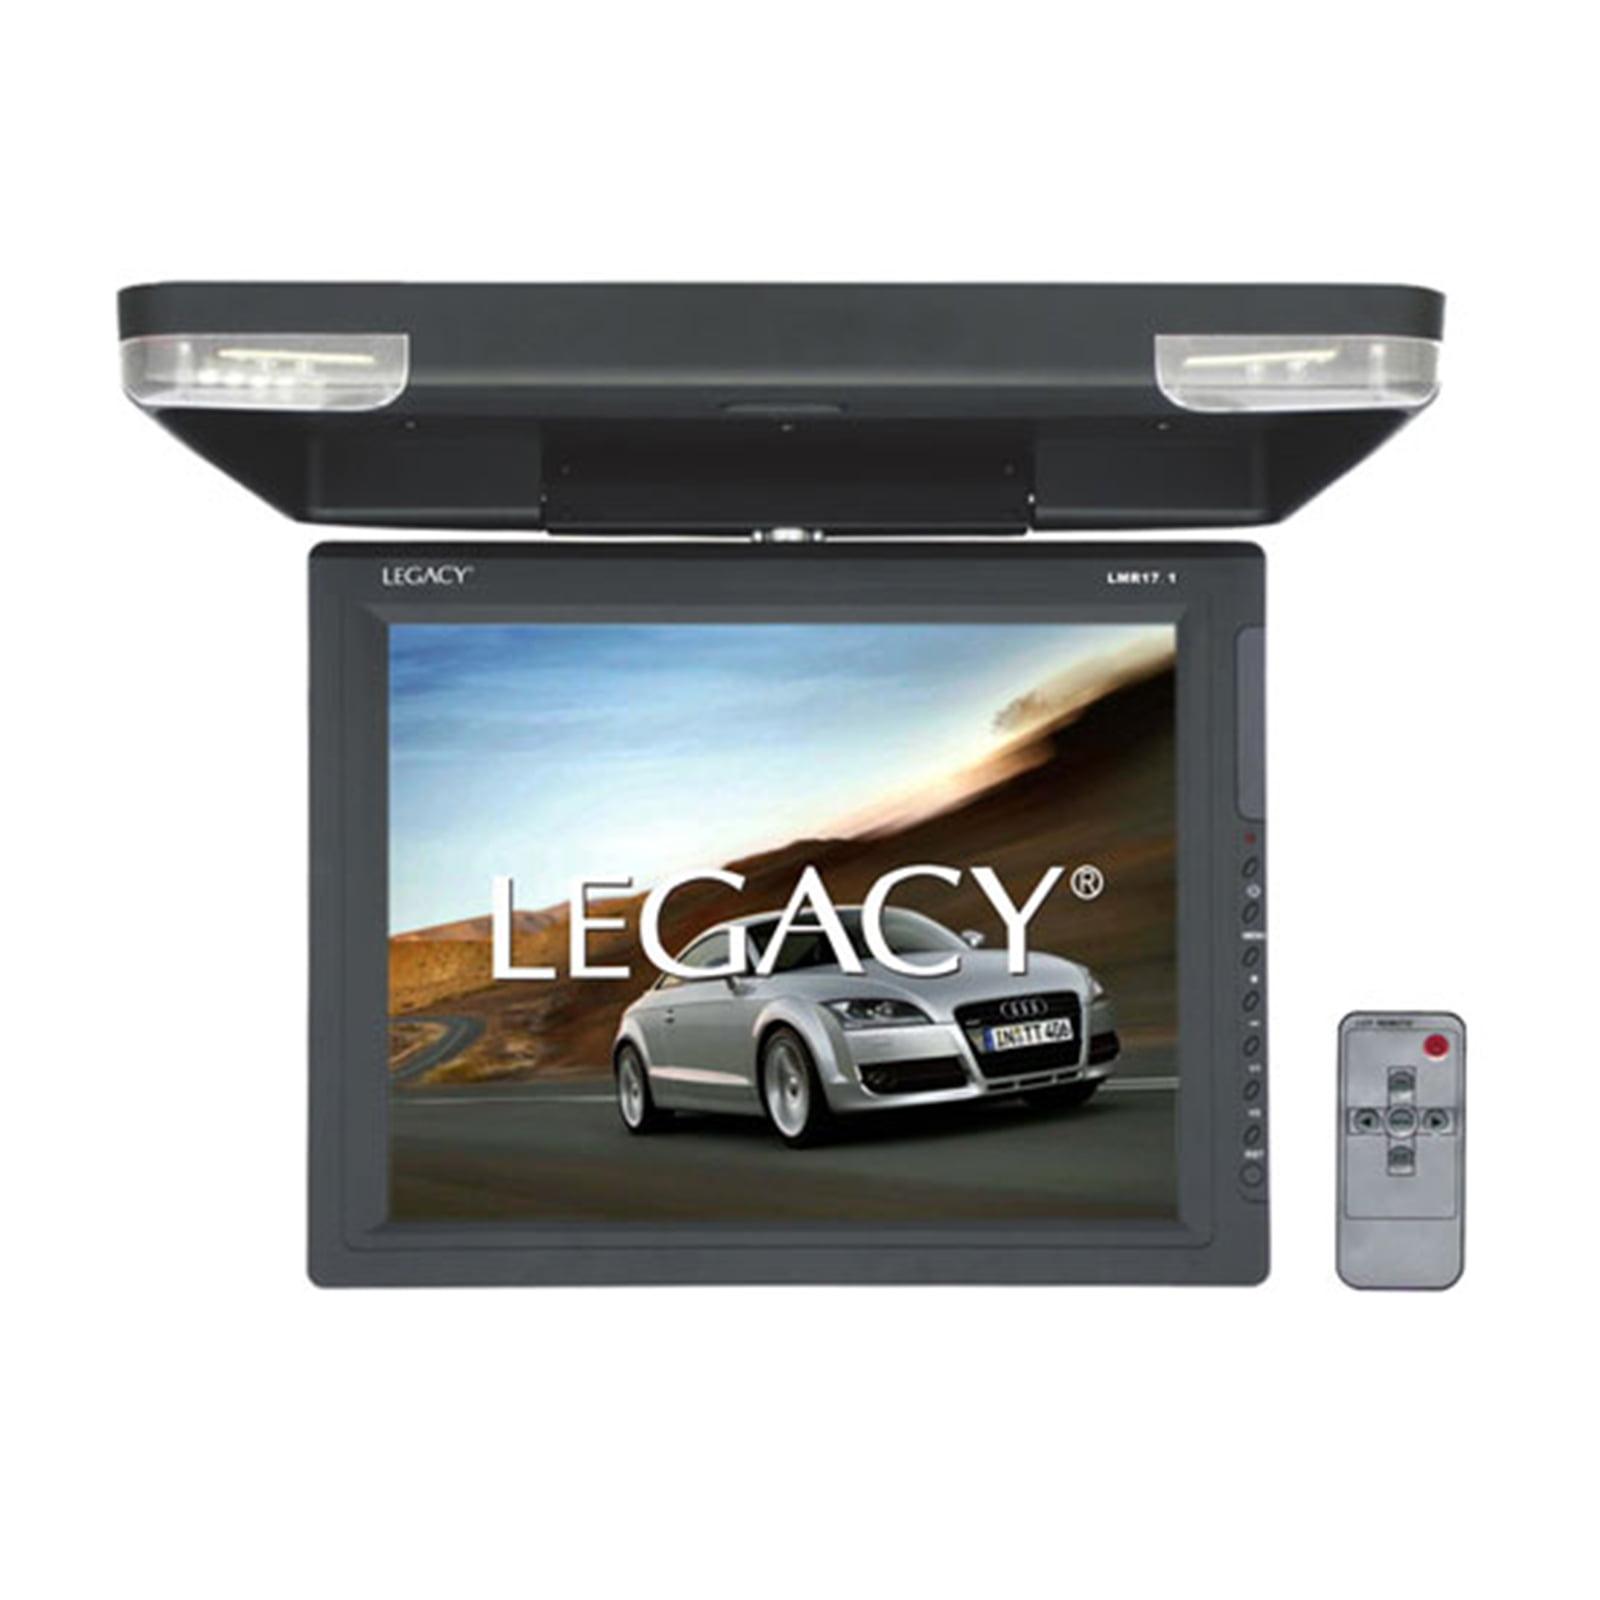 "15.1"" Hi-Res Flip Down Roof Mount LCD Monitor & IR Transmitter"